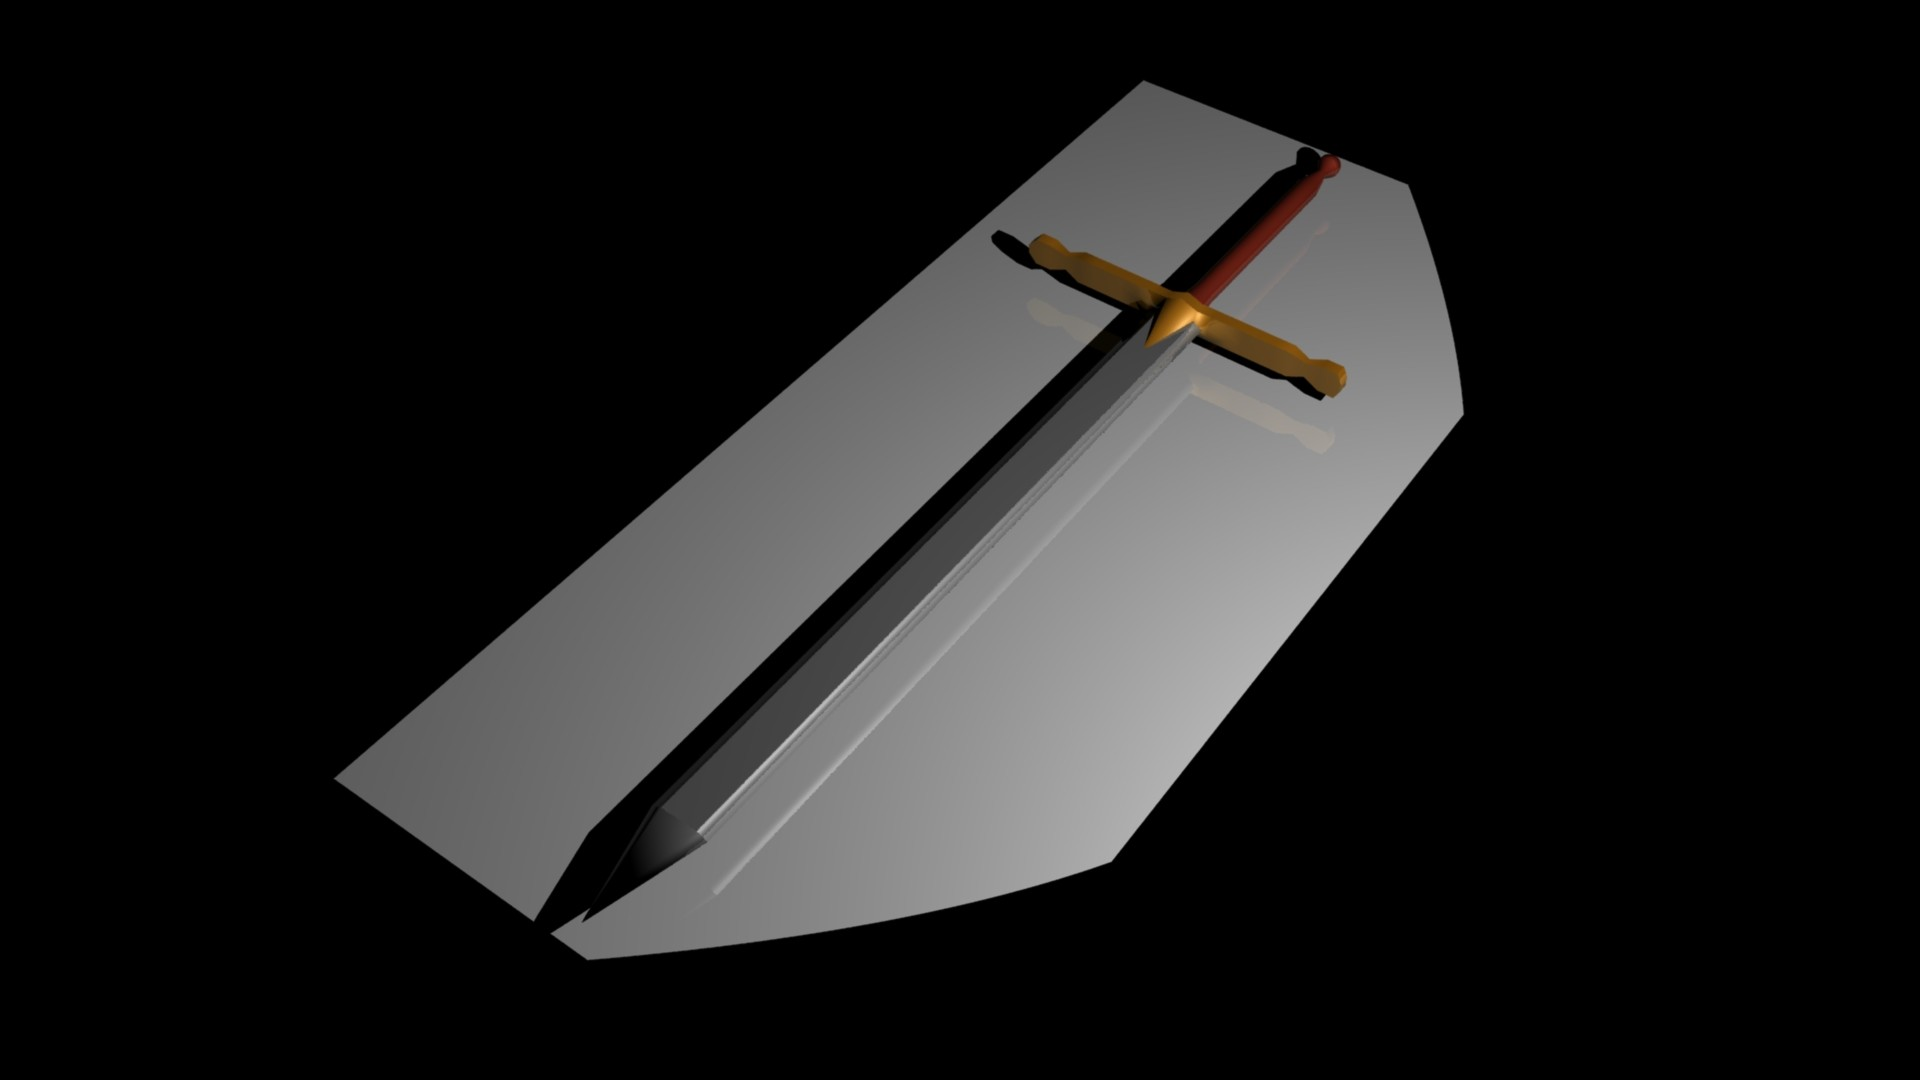 Joao salvadoretti sword4